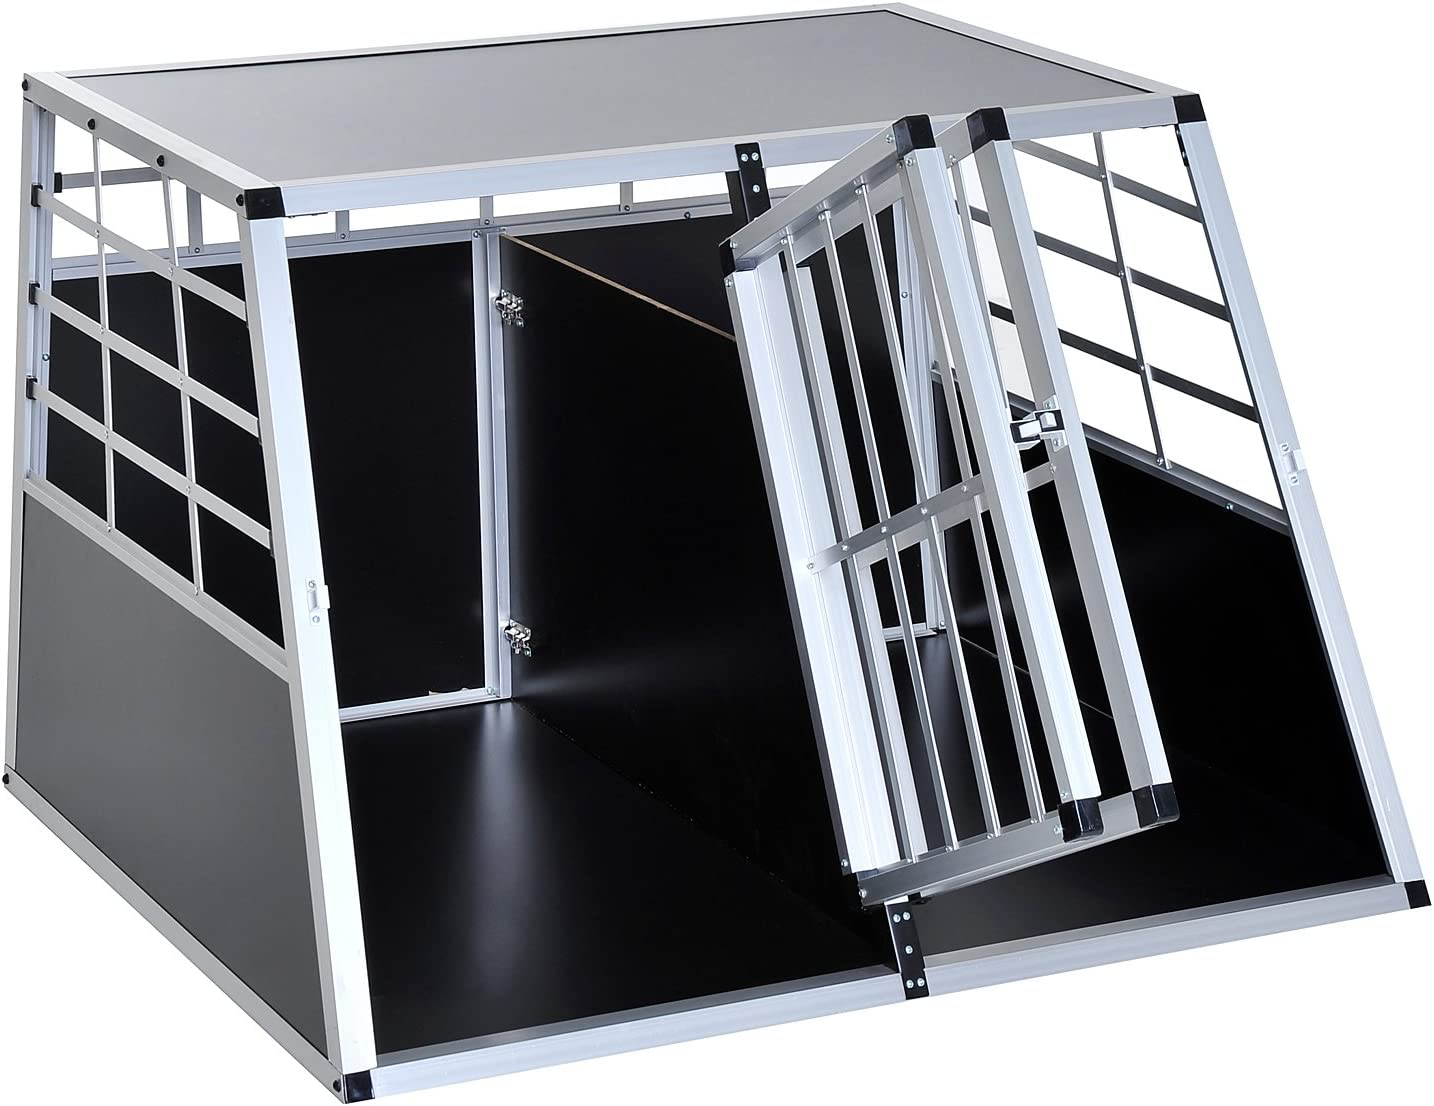 Jaula de transporte para perros, aluminio negro, 104 x 91 x 69 cm: Amazon.es: Productos para mascotas